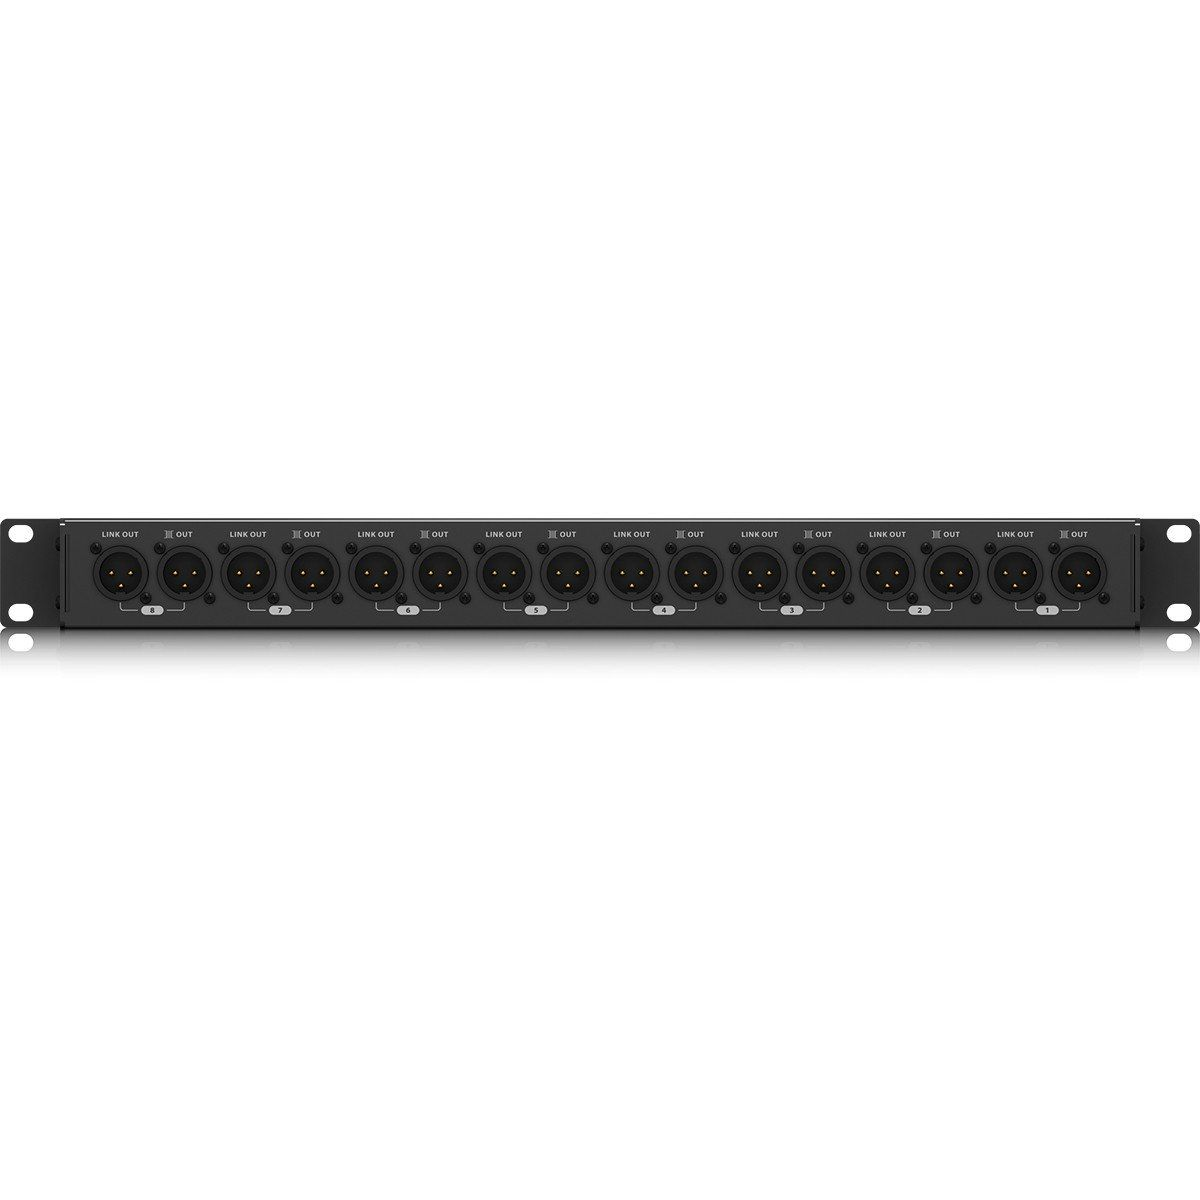 Behringer UltraLink MS8000 Amplificador UltraLink MS8000 8 Canais